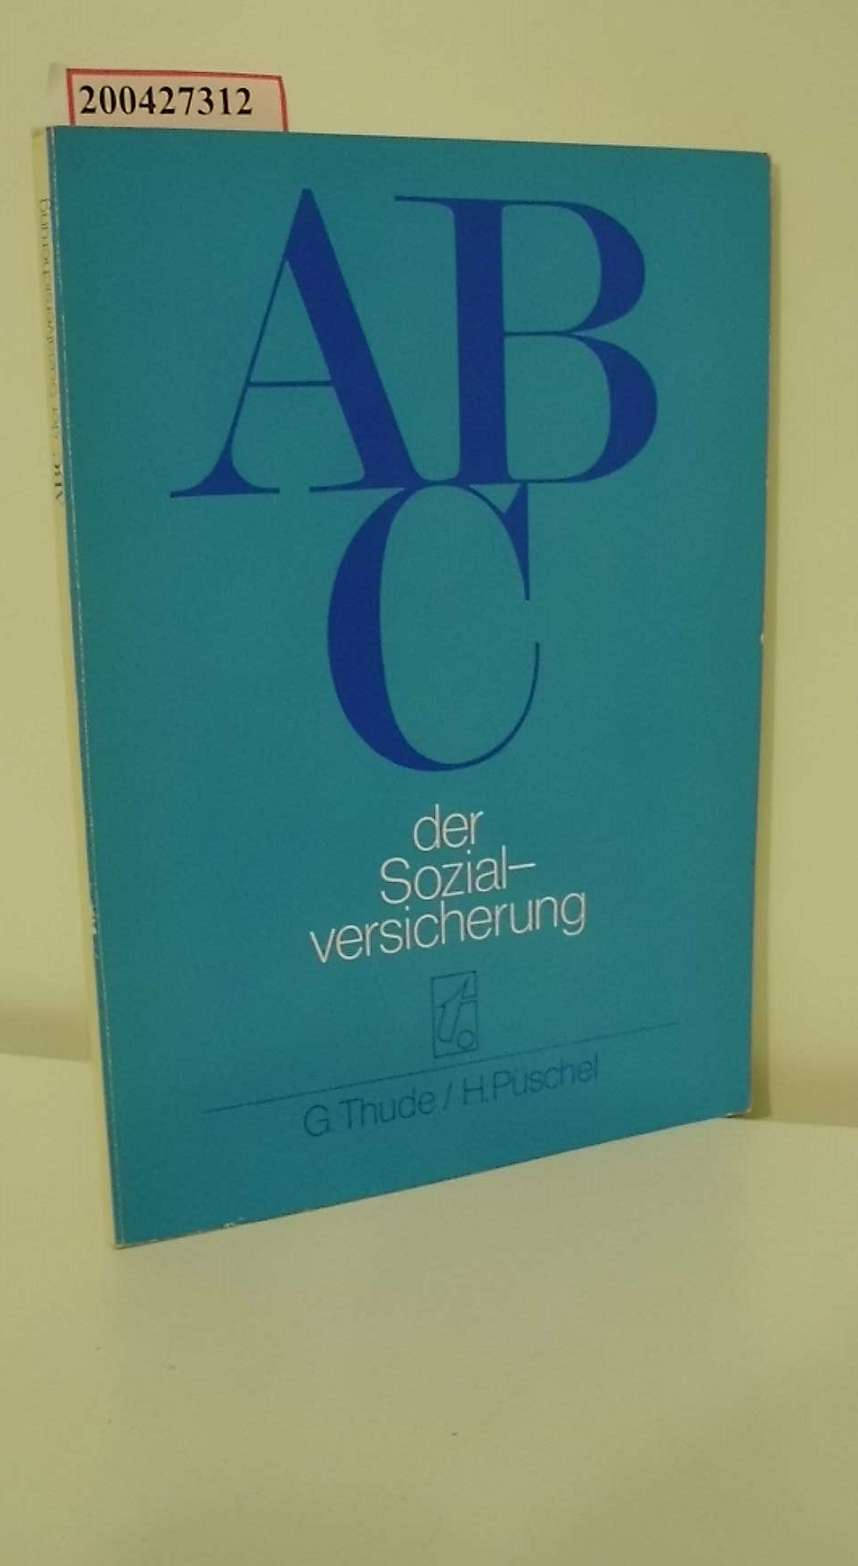 ABC der Sozialversicherung / Günther Thude ; Herbert Püschel 4. Aufl.